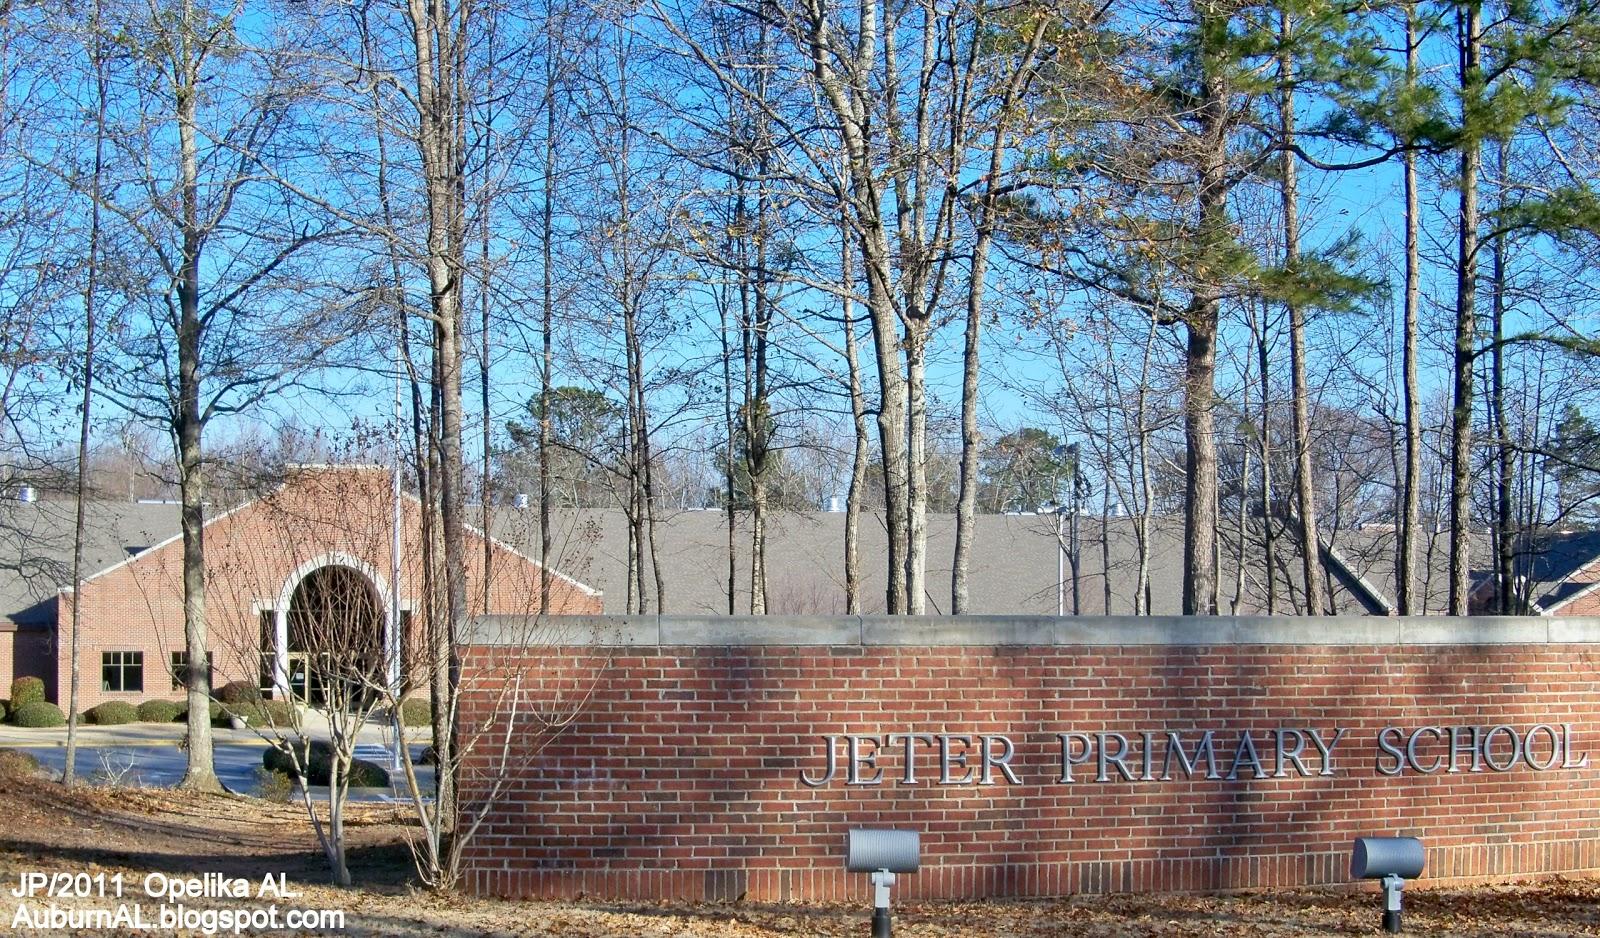 Alabama lee county salem - Jeter Primary School Opelika Alabama Jeter Primary Public School Lee County Opelika Al Public School